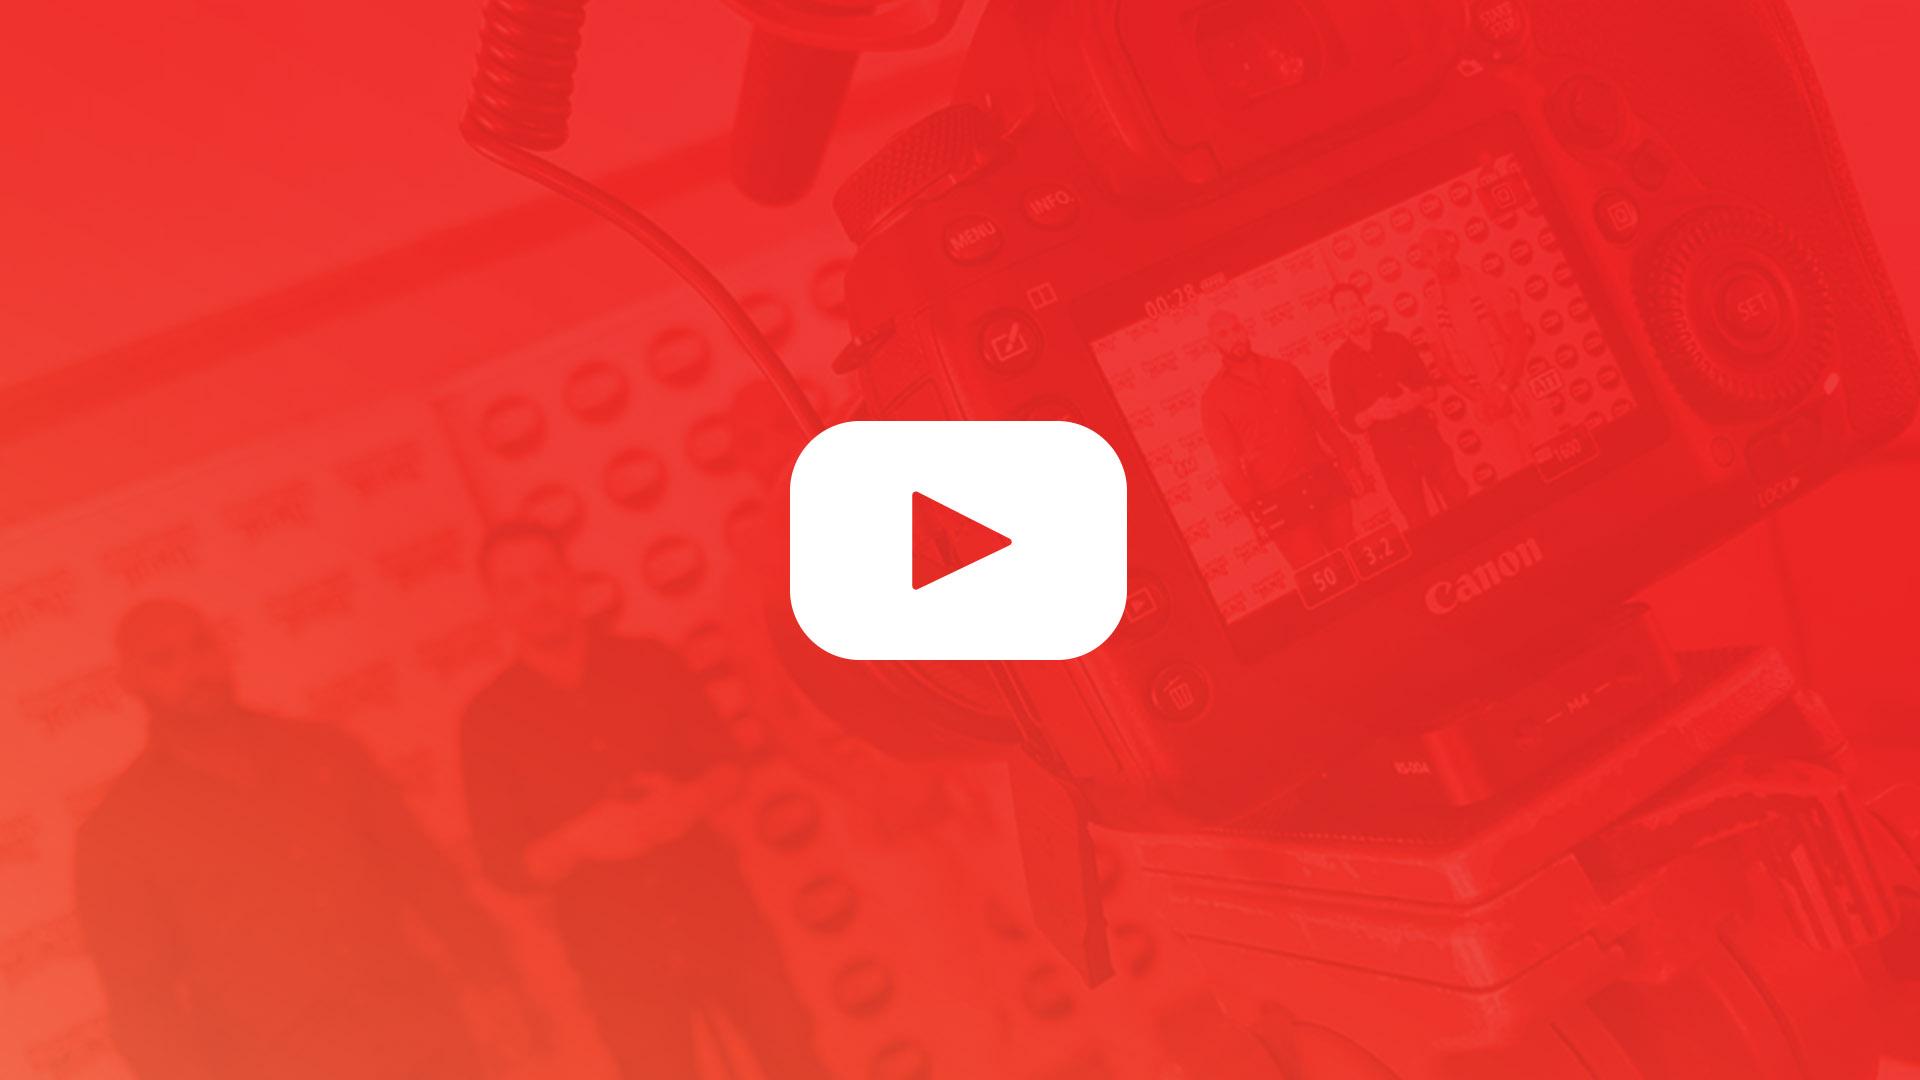 WhereToFindUs-YouTube.jpg